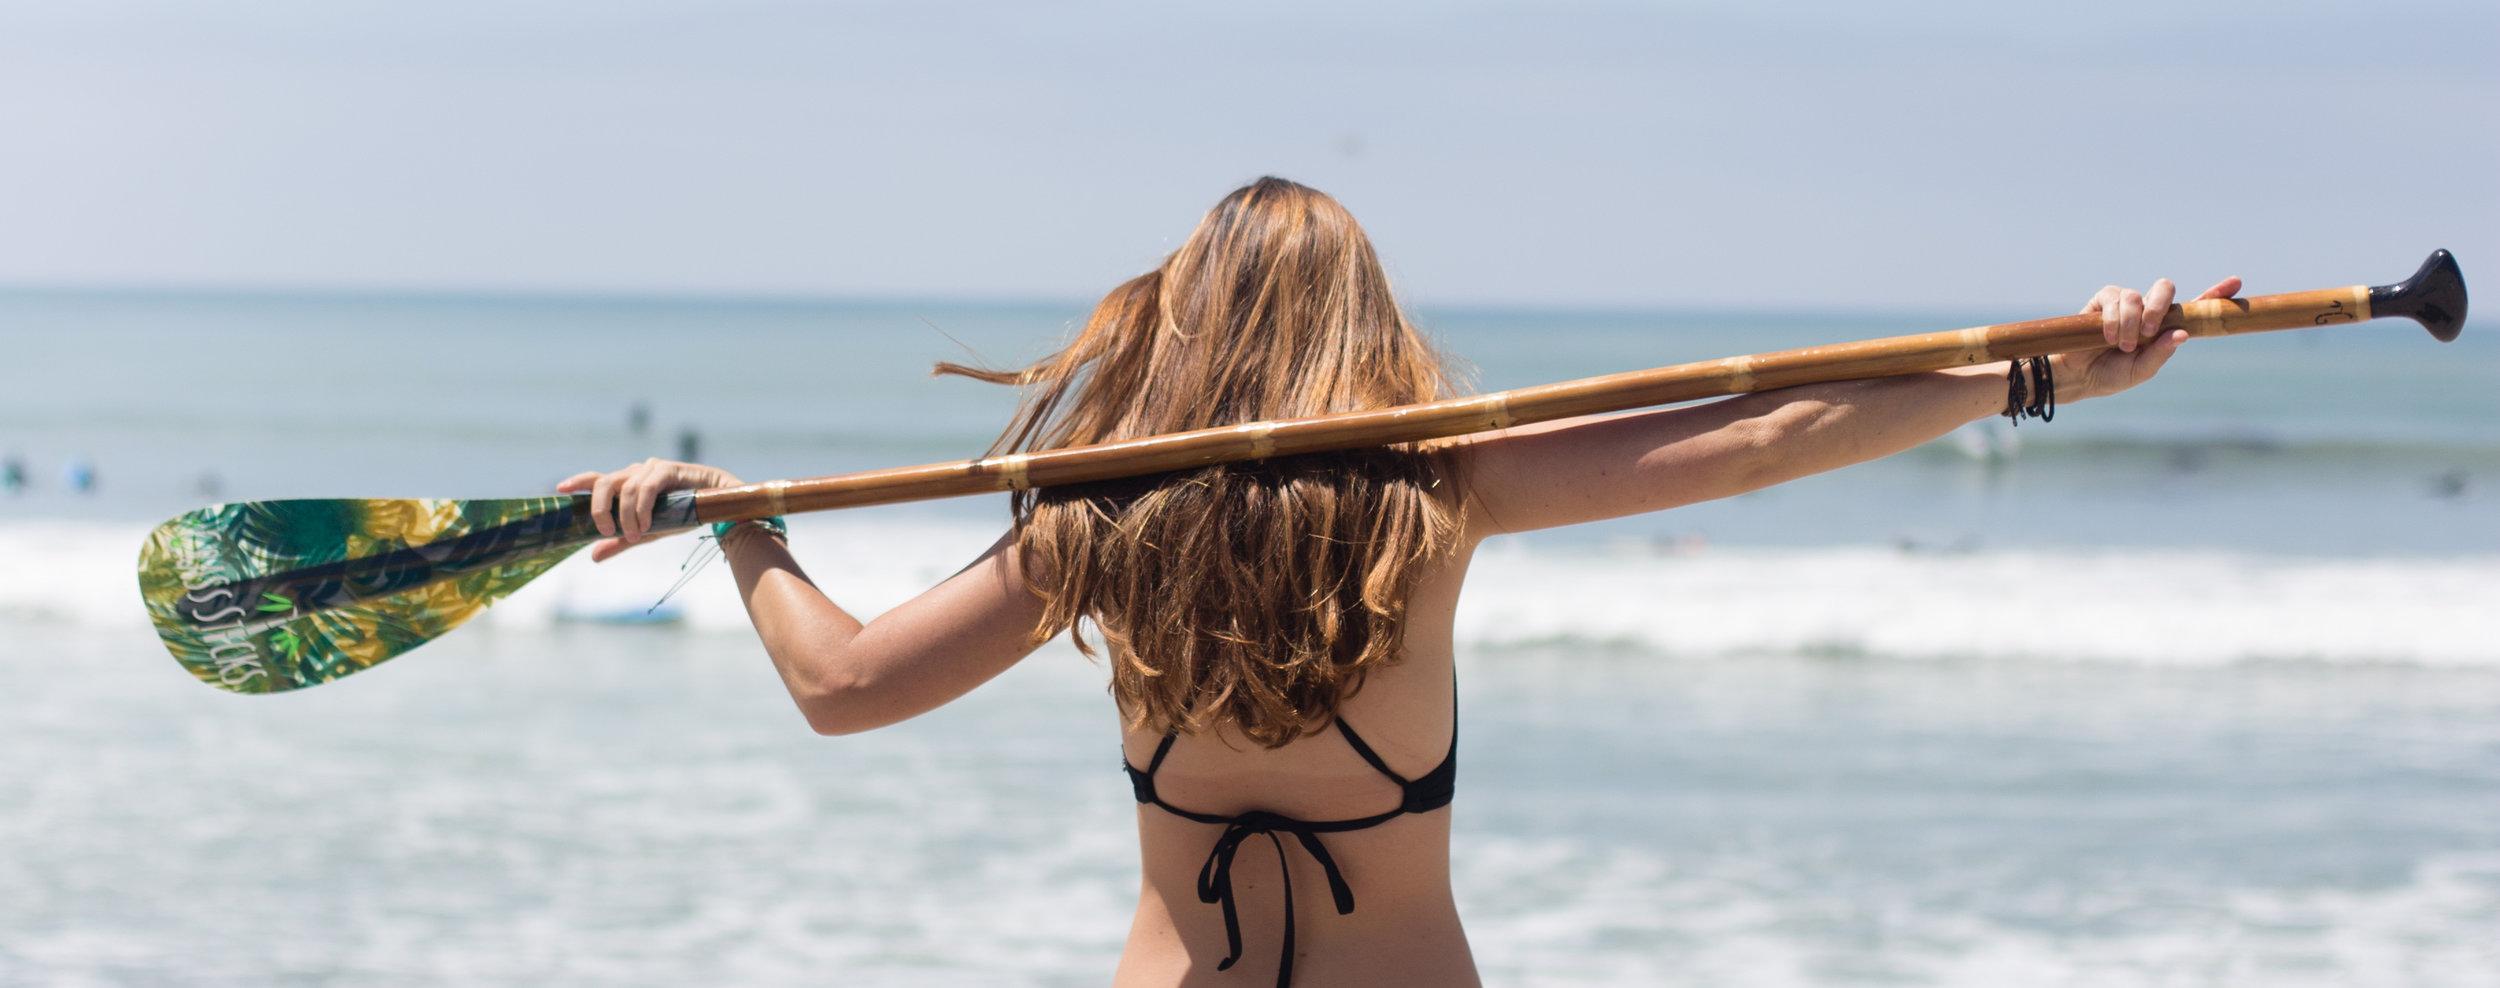 introducing sup & canoe sticks